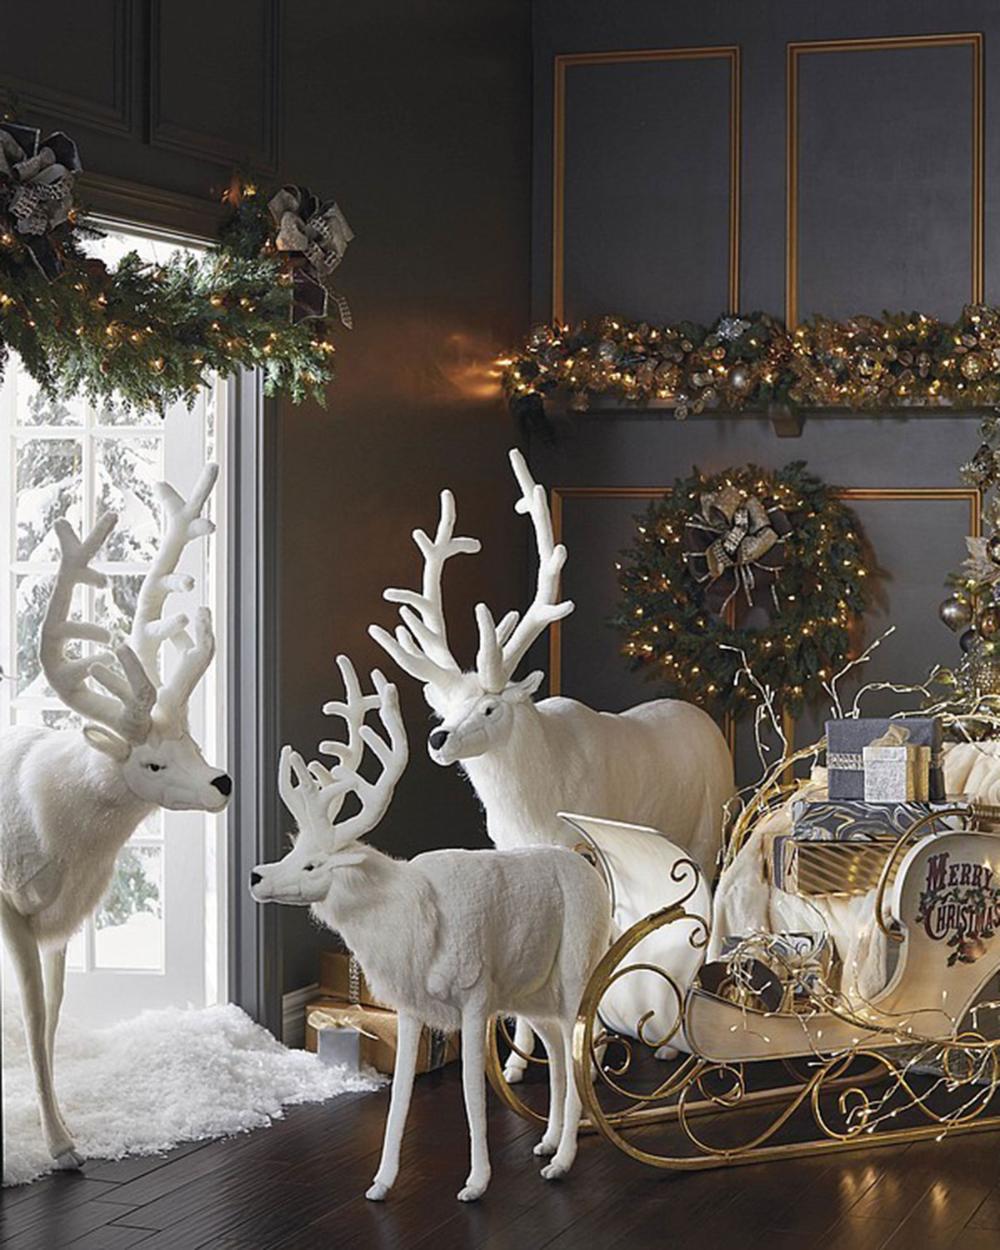 Hansa Toys Usa White Mechanical Reindeer Christmas Interiors Reindeer Decorations White Christmas Decor